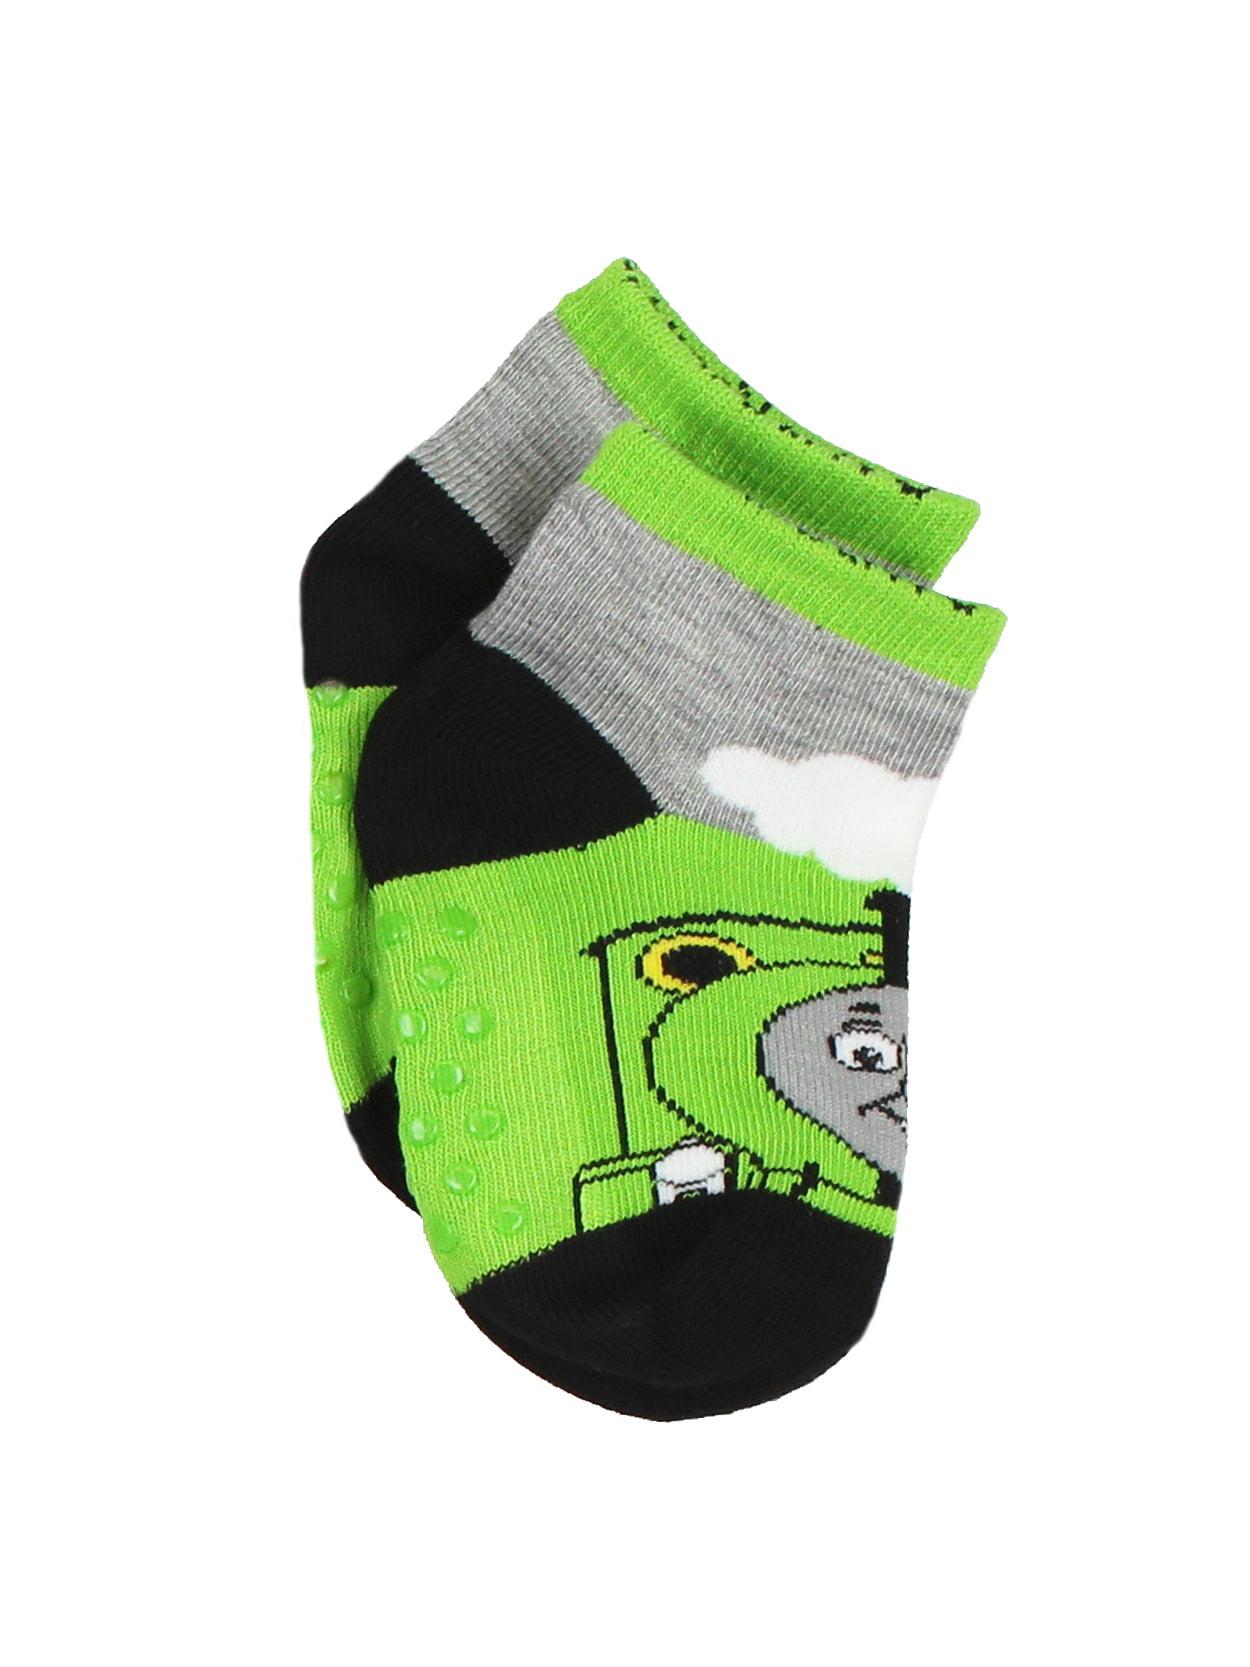 Thomas and Friends Boys 6 pack Gripper Socks TE017DQS Toddler